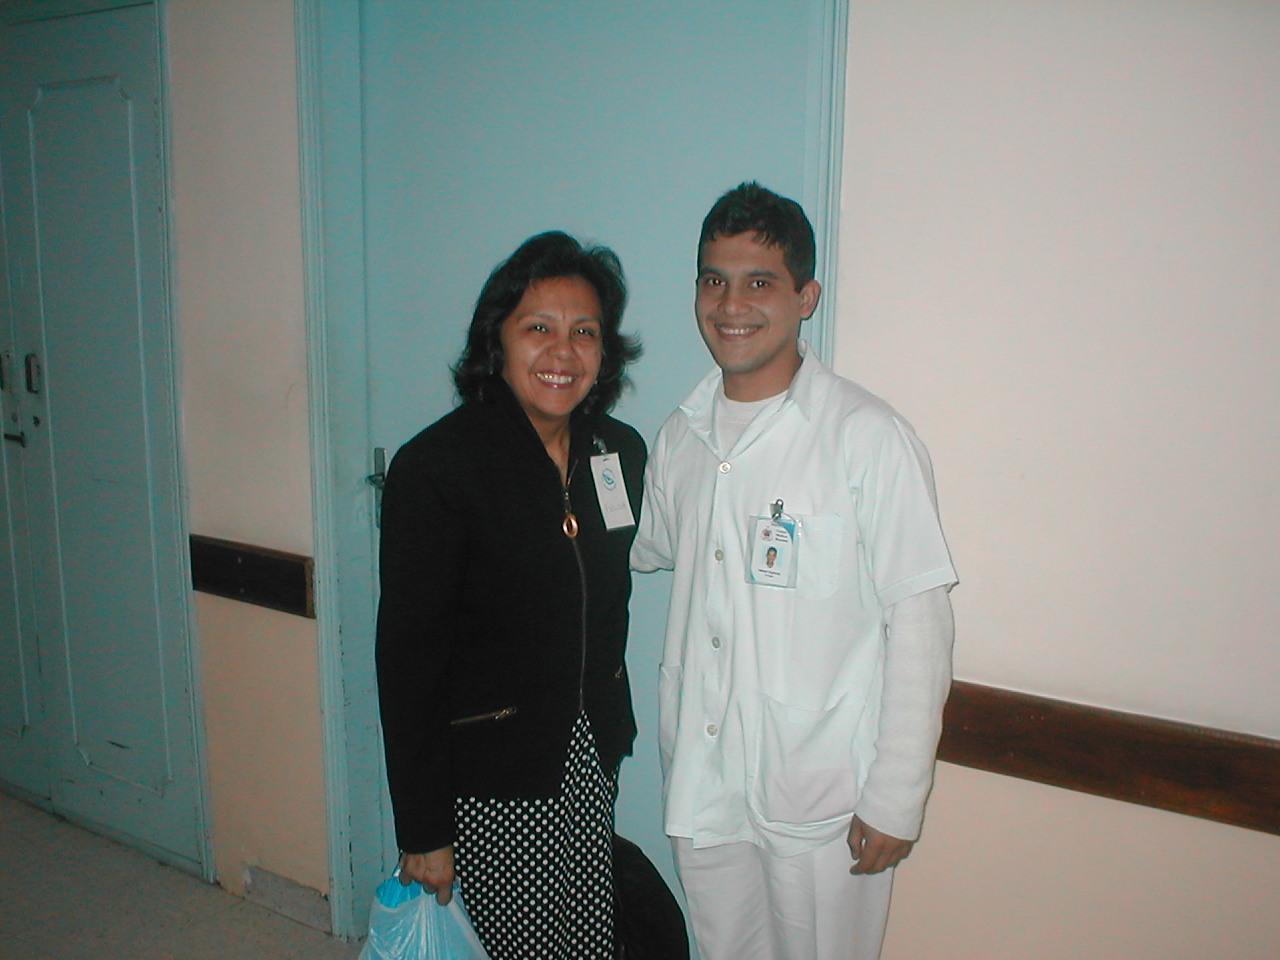 Felisa with Nelson  Diaz, Clyde E. Bay Foundation Nurse Tech